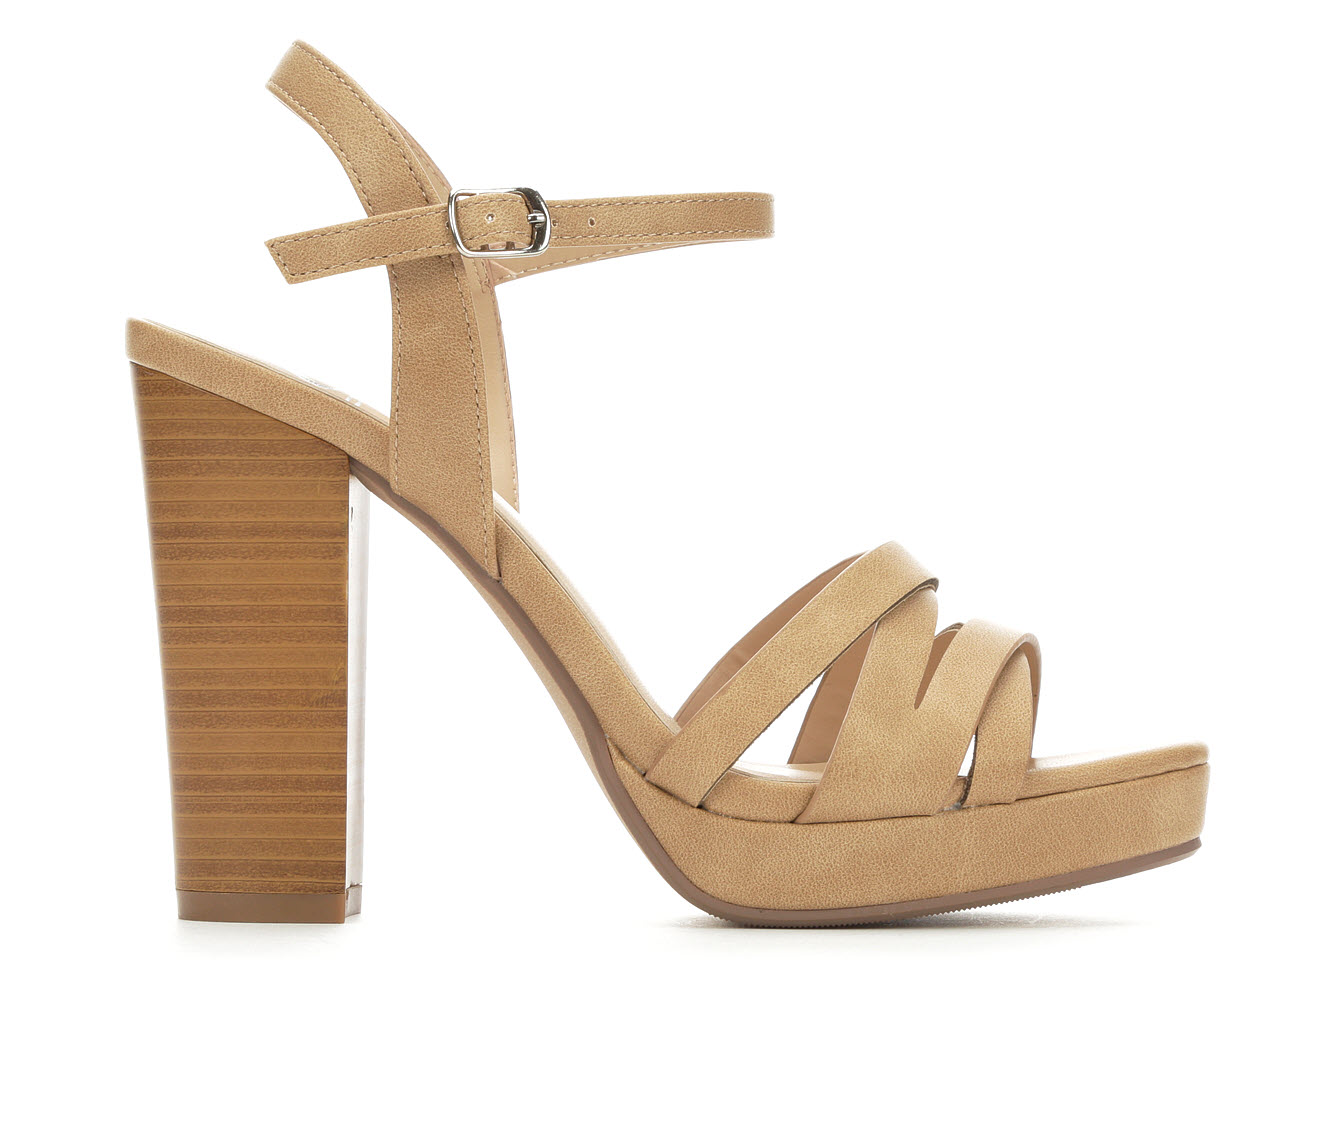 Delicious Sunday Women's Dress Shoe (Beige Faux Leather)